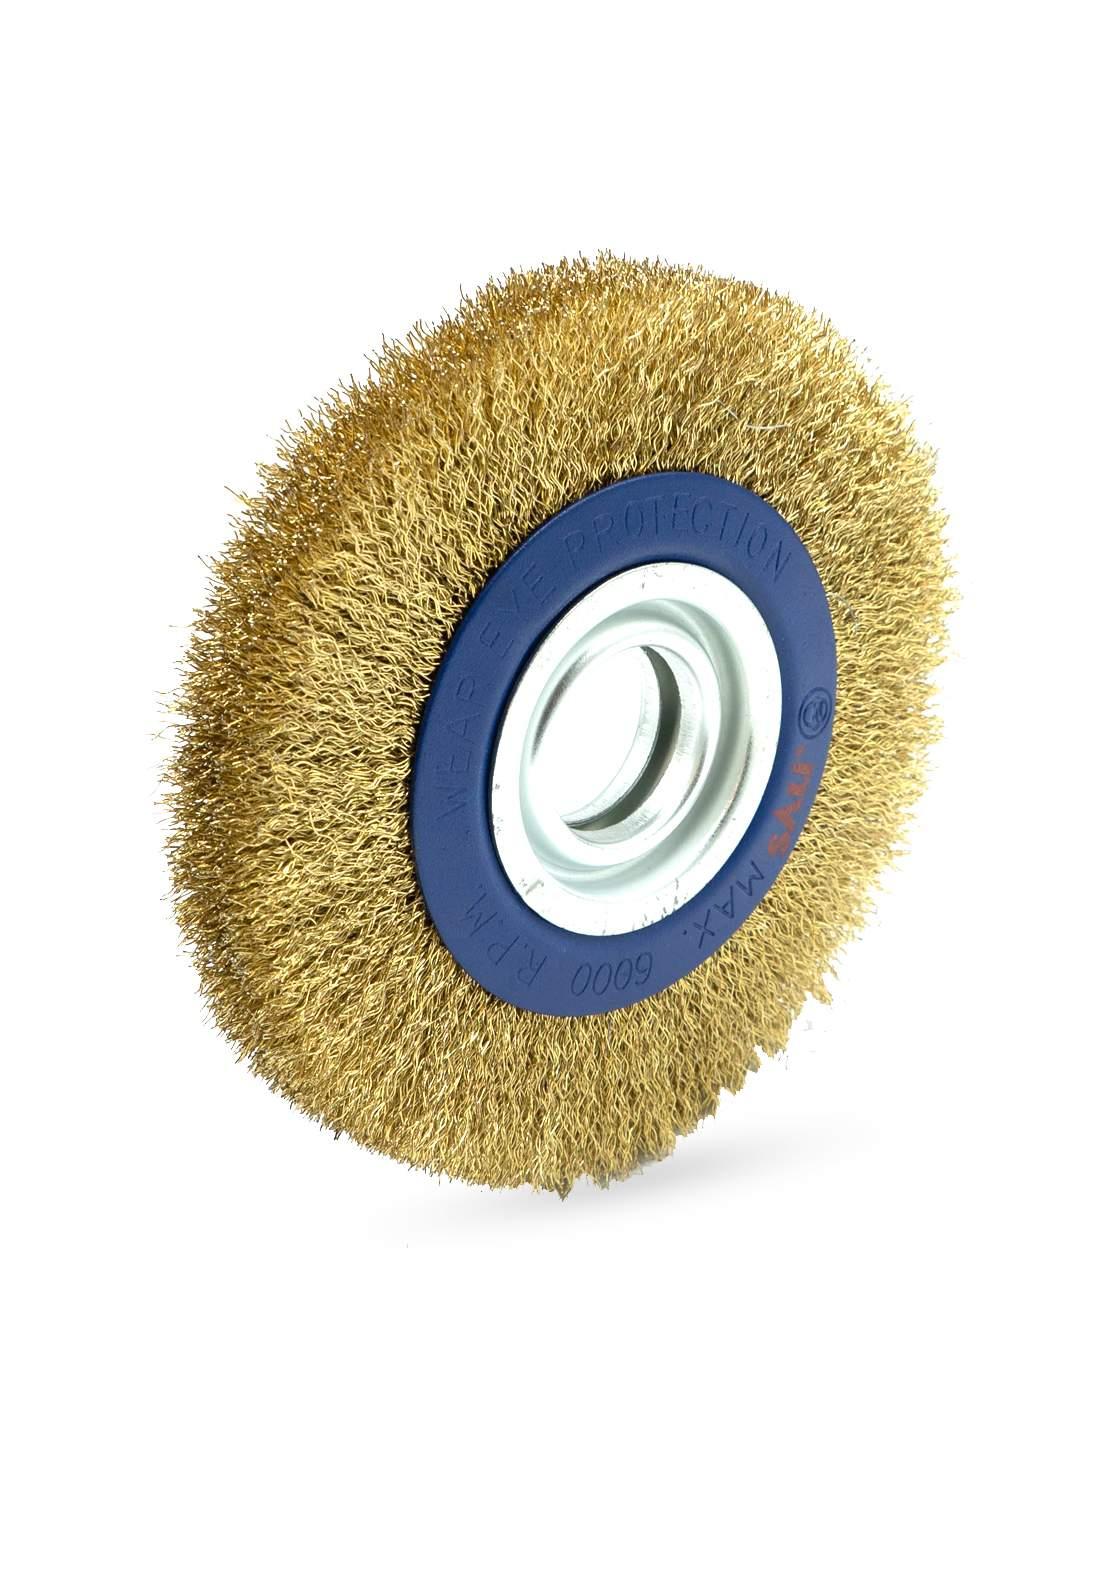 Sali 7230 Tools Wire Brush 120 mm فرشاة تنظيف الاسطح المعدنية